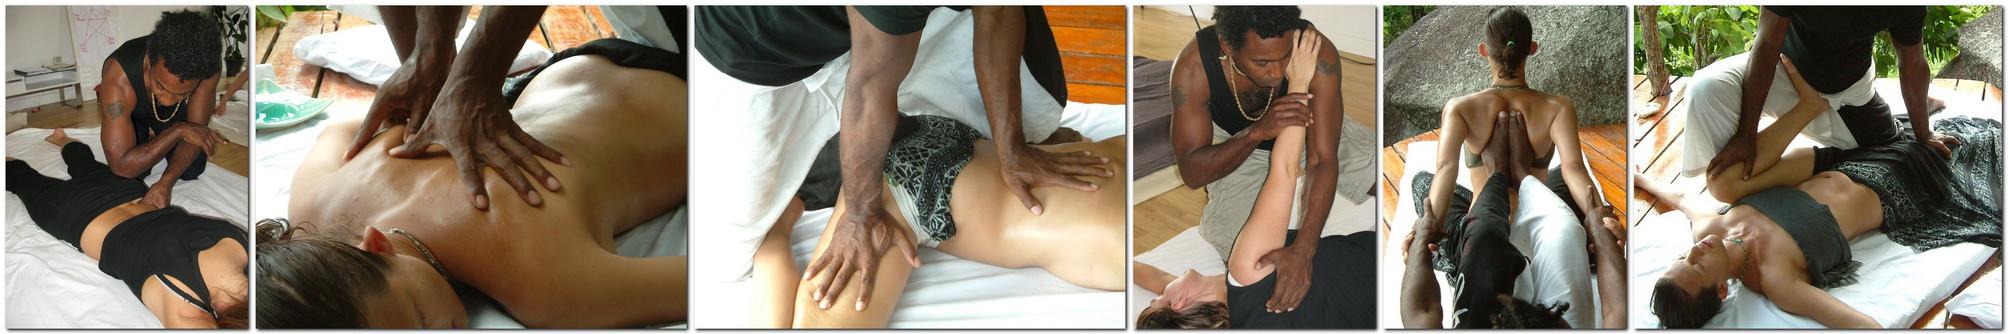 2011-09-06_162128 massage 2.jpg